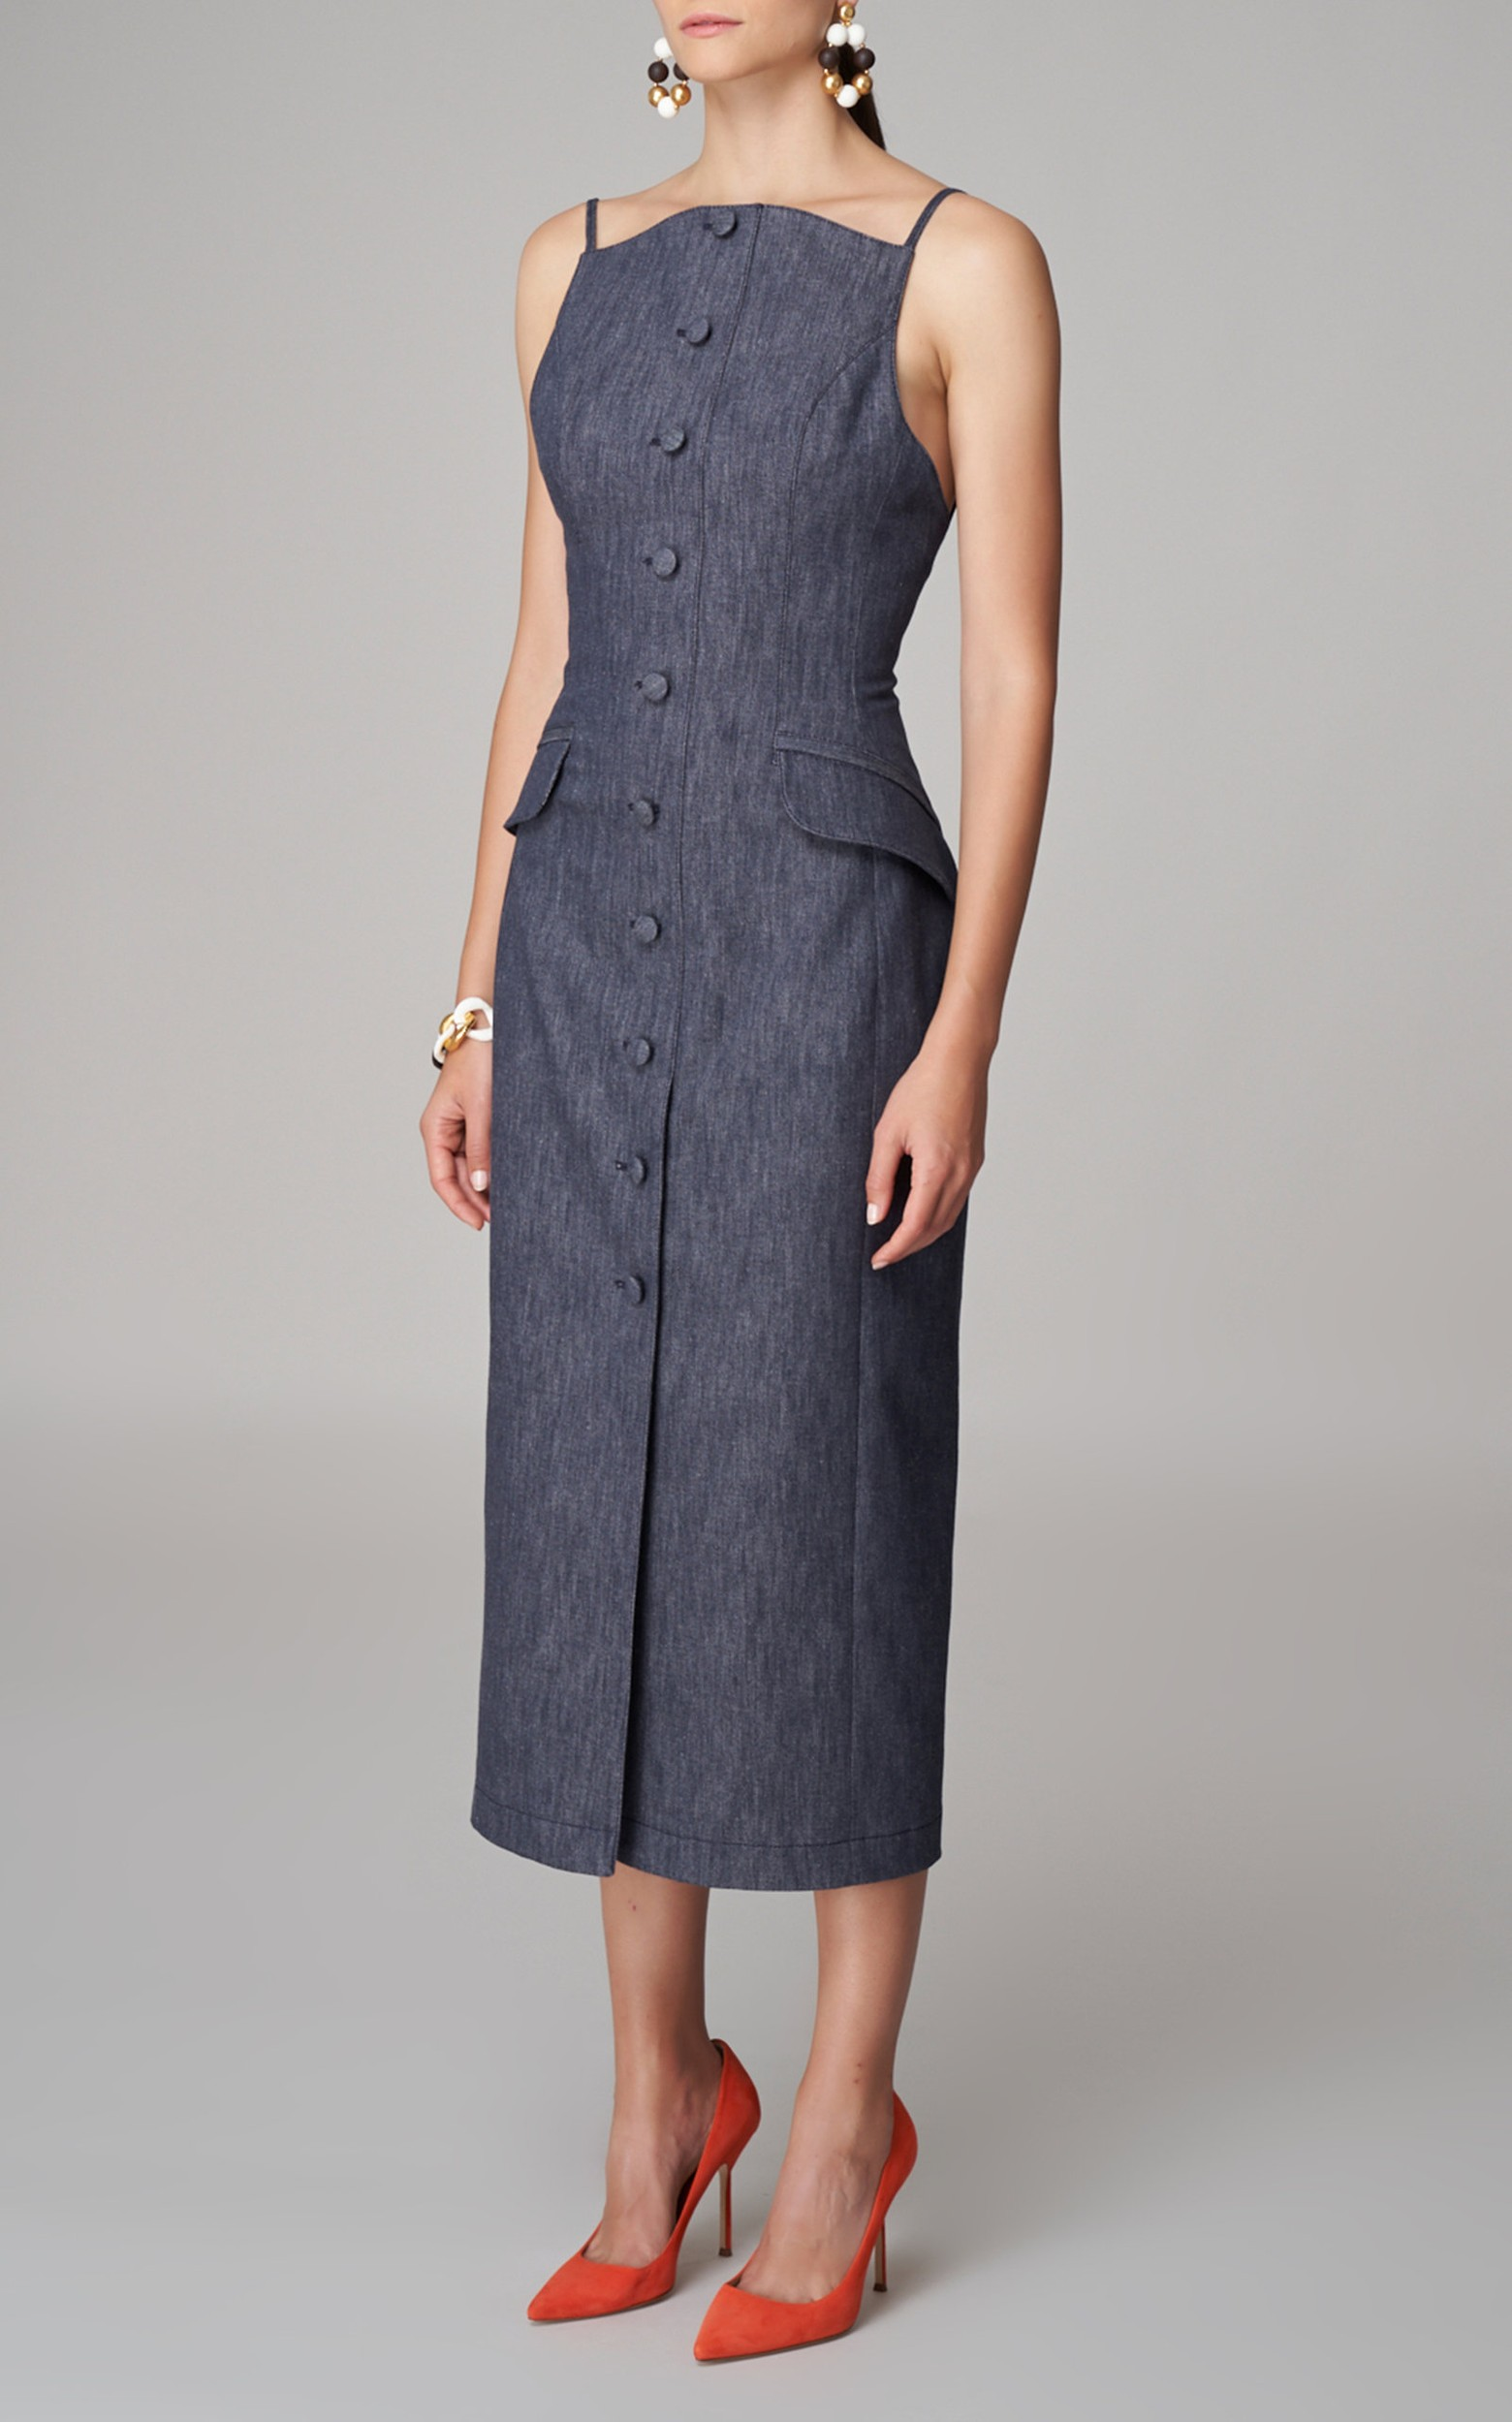 large_carolina-herrera-navy-stretch-denim-button-front-midi-dress